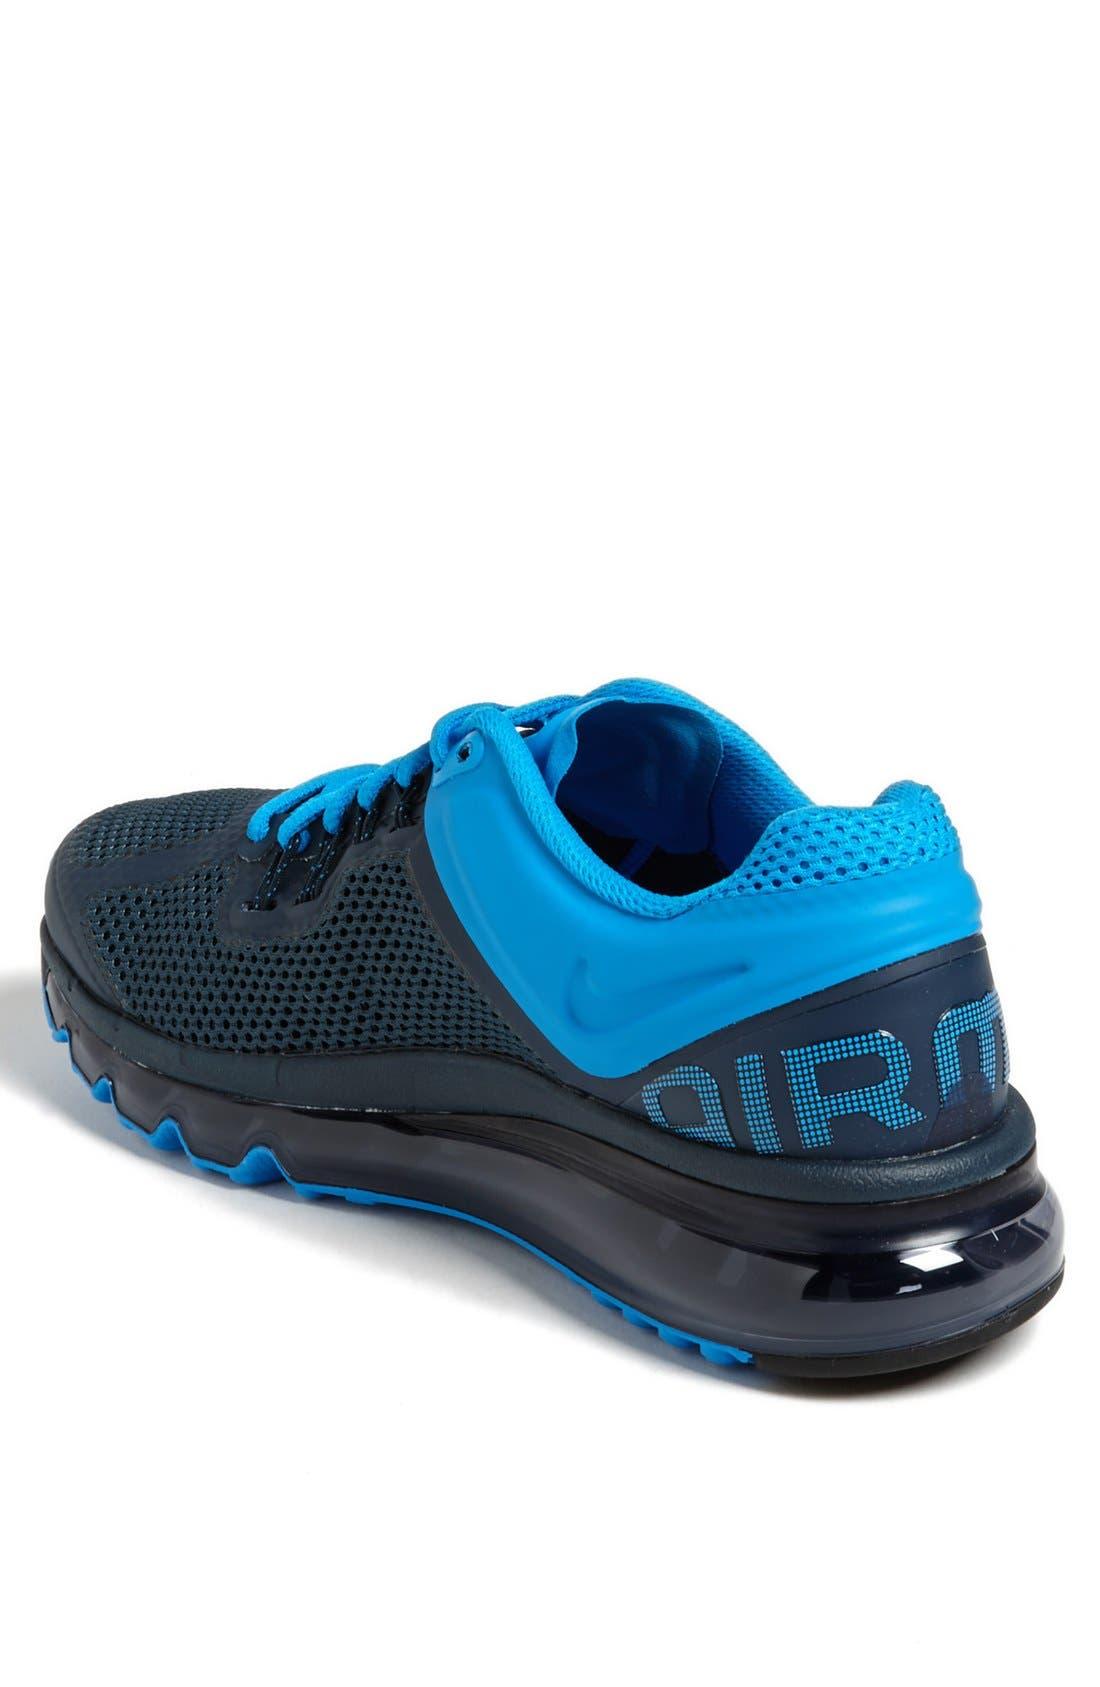 Alternate Image 2  - Nike 'Air Max+ 2013' Running Shoe (Men)